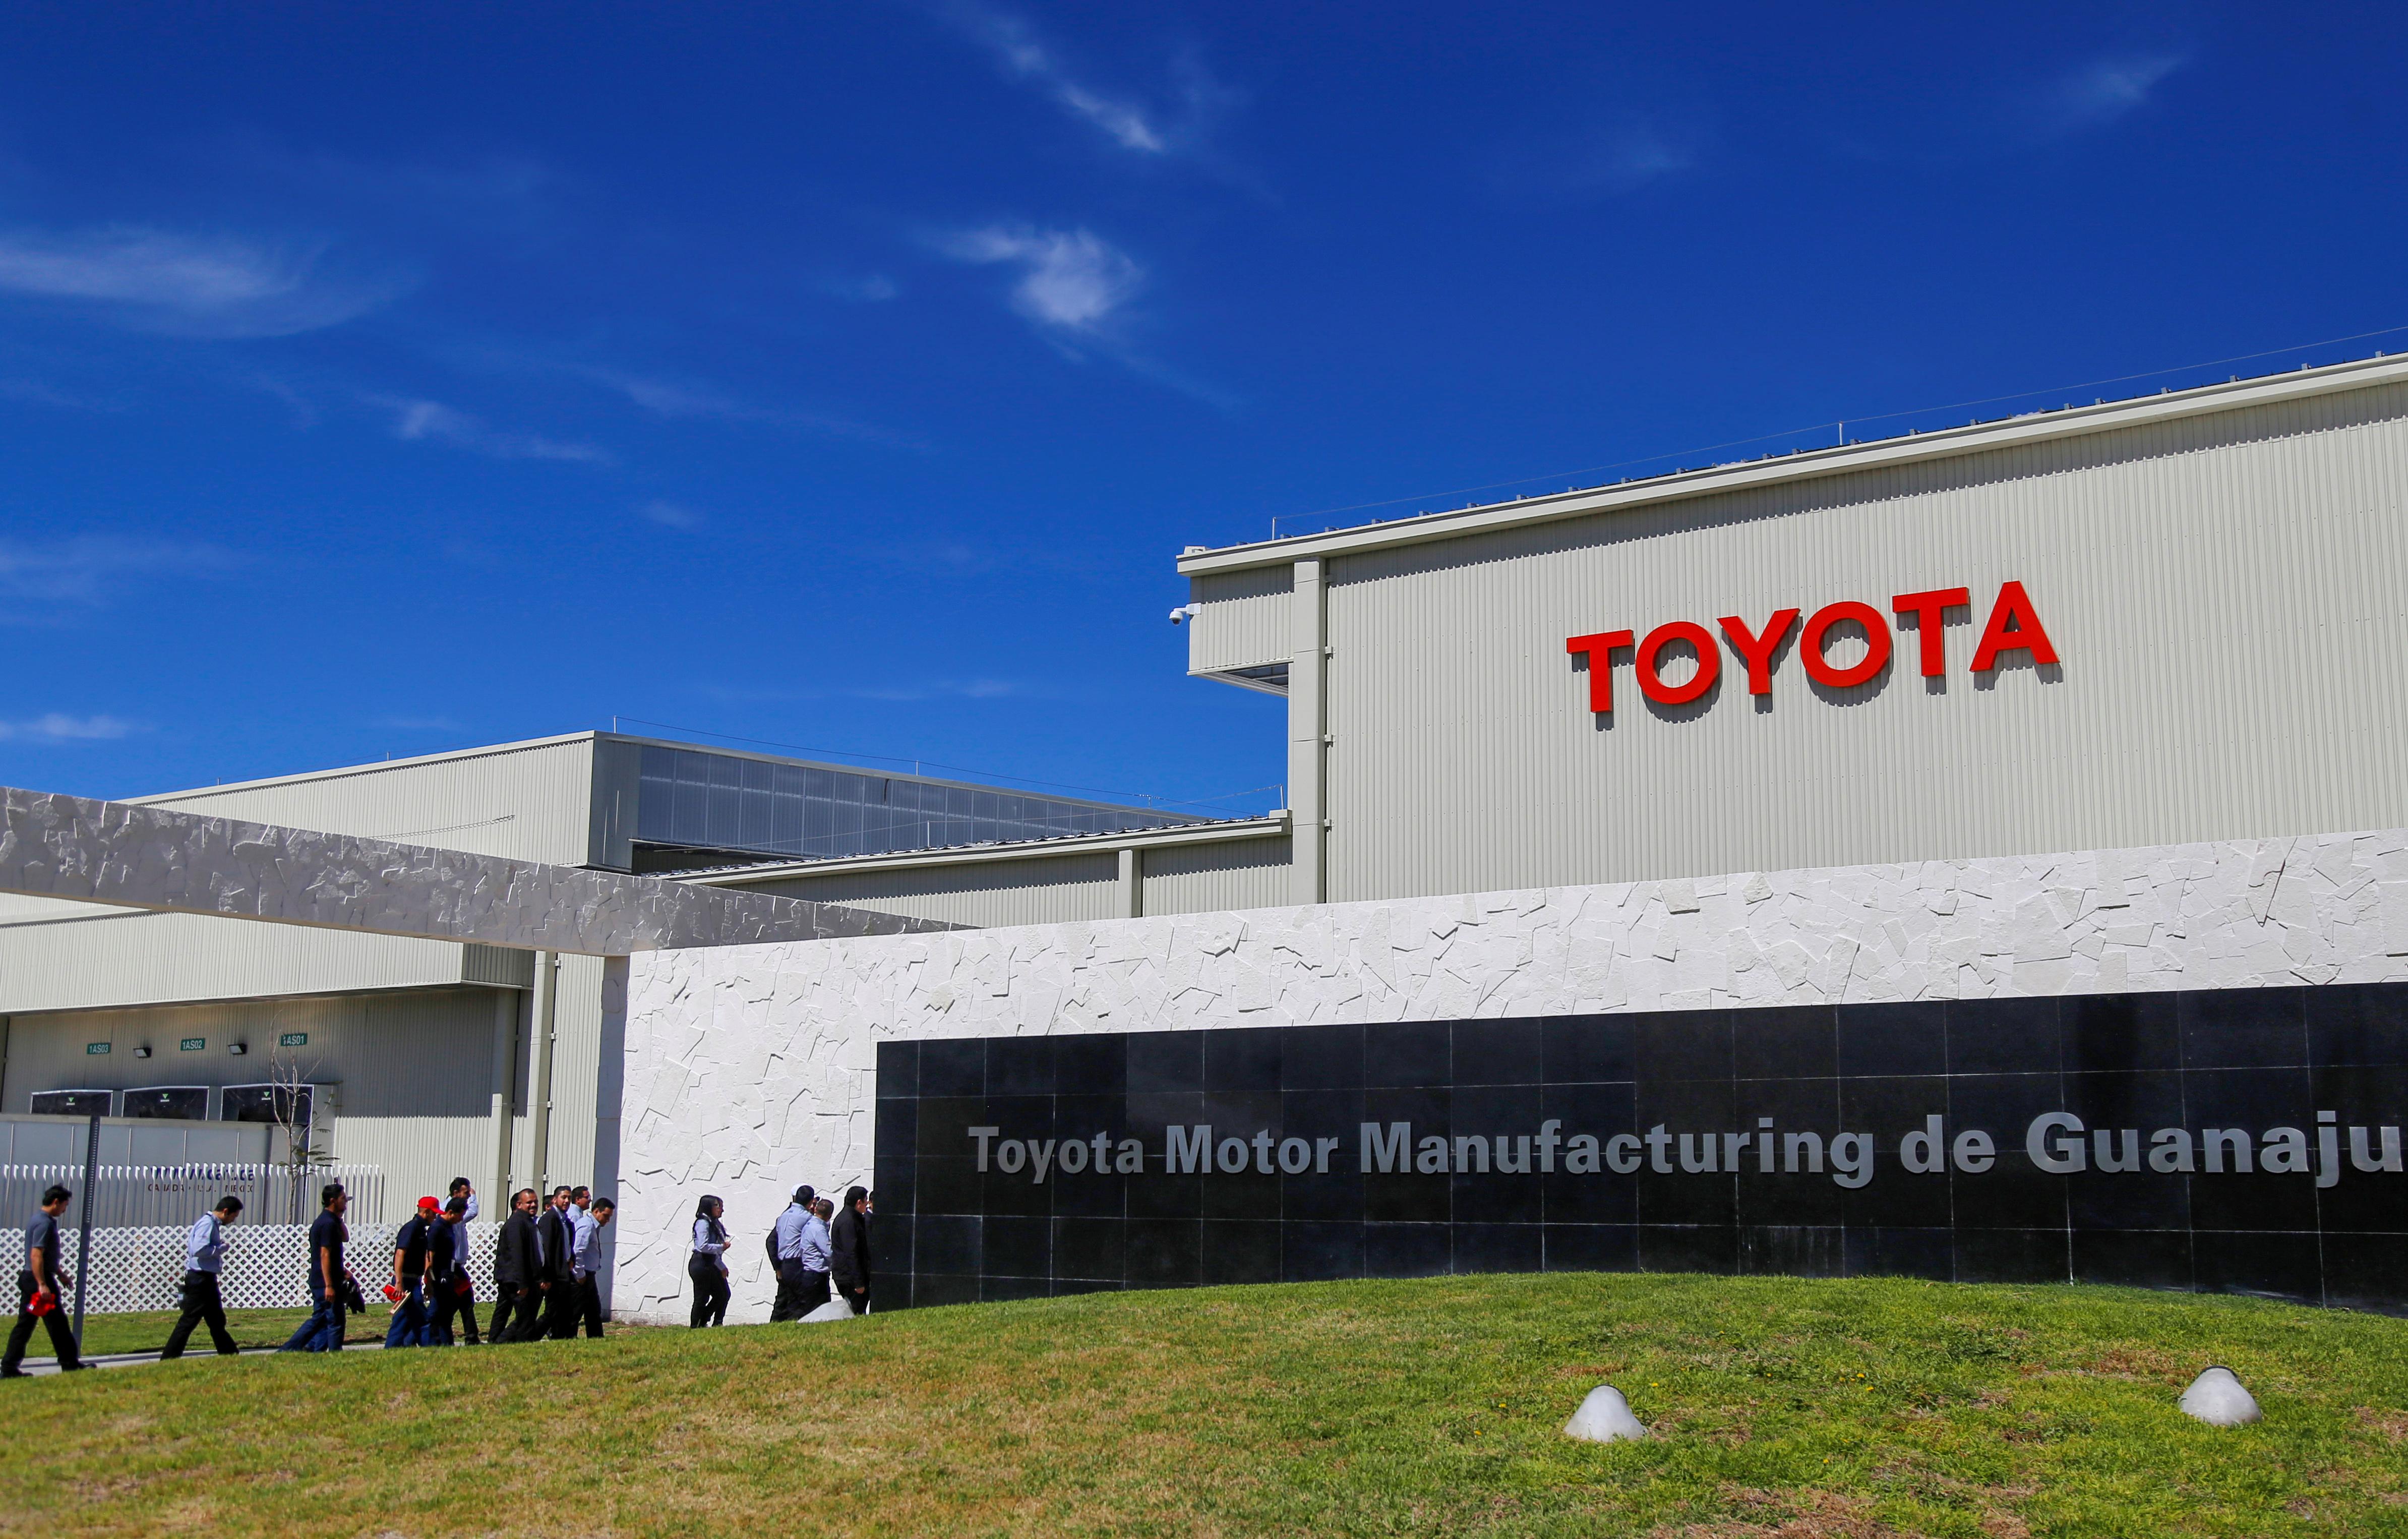 Employees walk at the Toyota Motor Corp new plant in Apaseo El Grande in Mexico's central state of Guanajuato, Mexico February 6, 2020. REUTERS/Sergio Maldonado